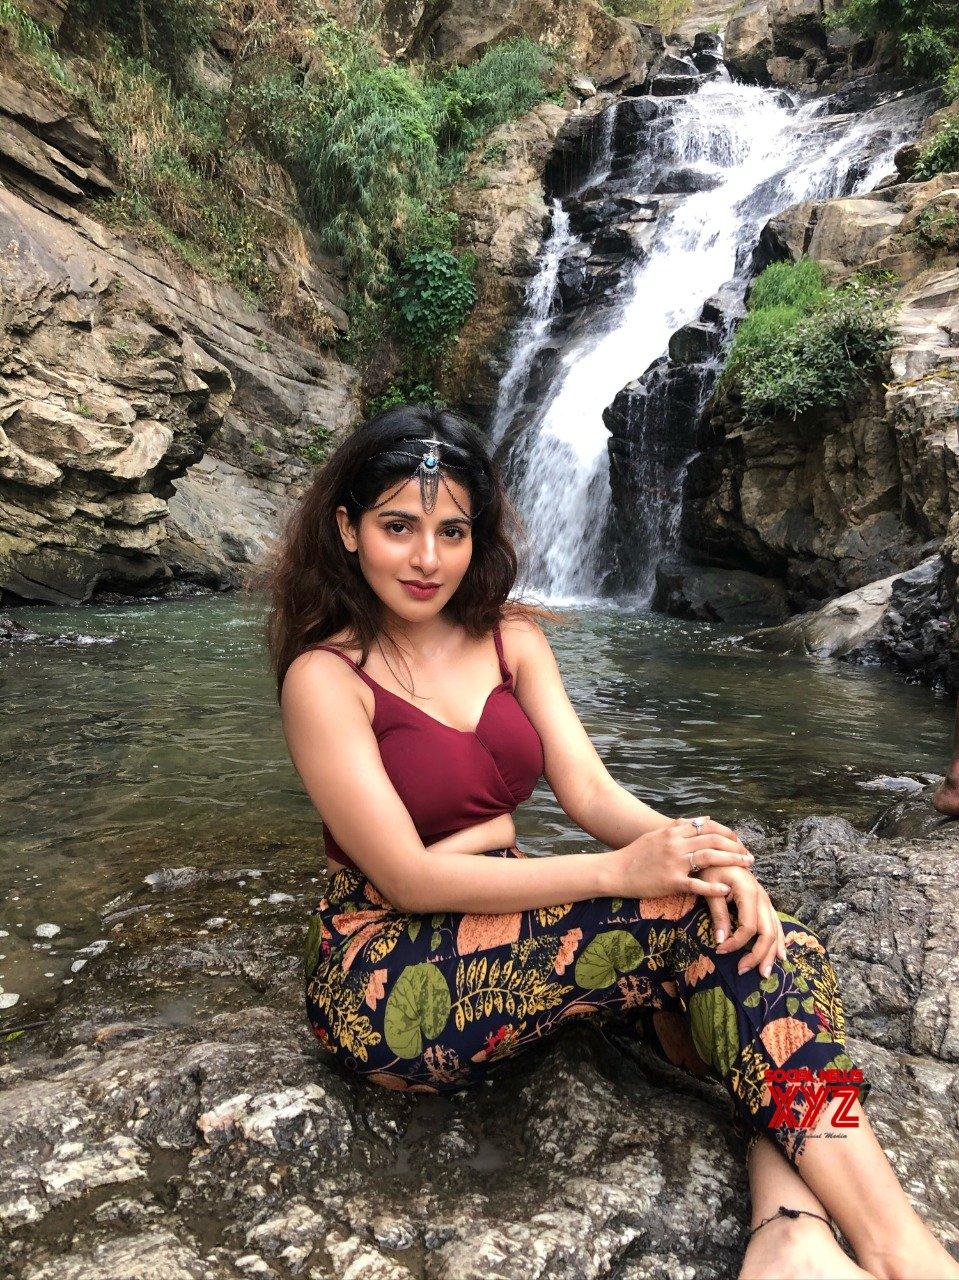 Actress Iswarya Menon Sizzling Stills From A Photoshoot Shot Near A Waterfall